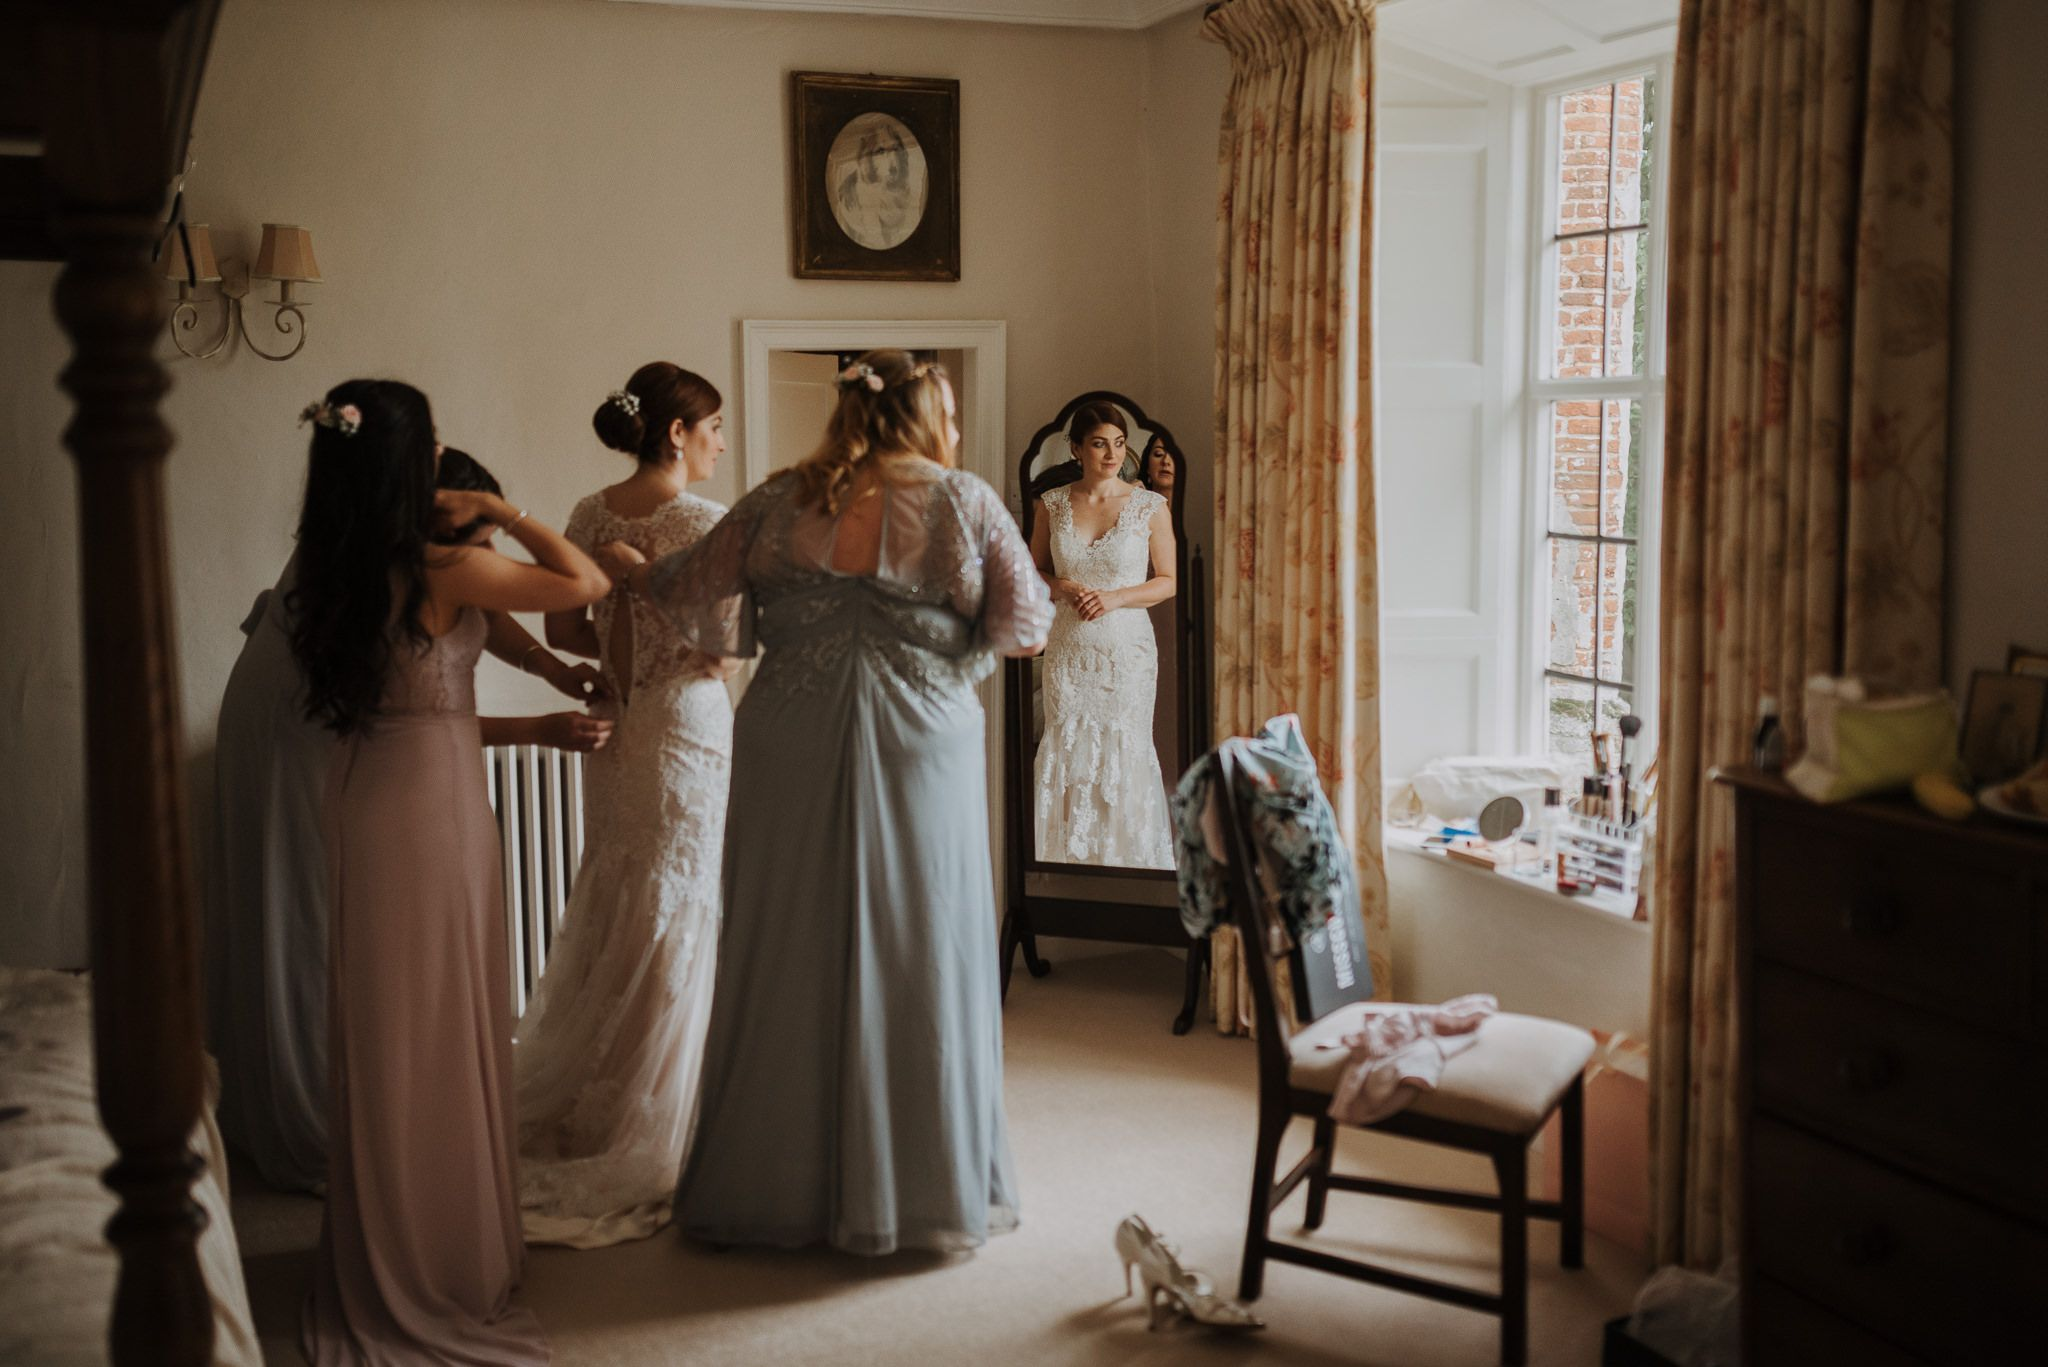 documentary-wedding-photographer-leeds-1.jpg